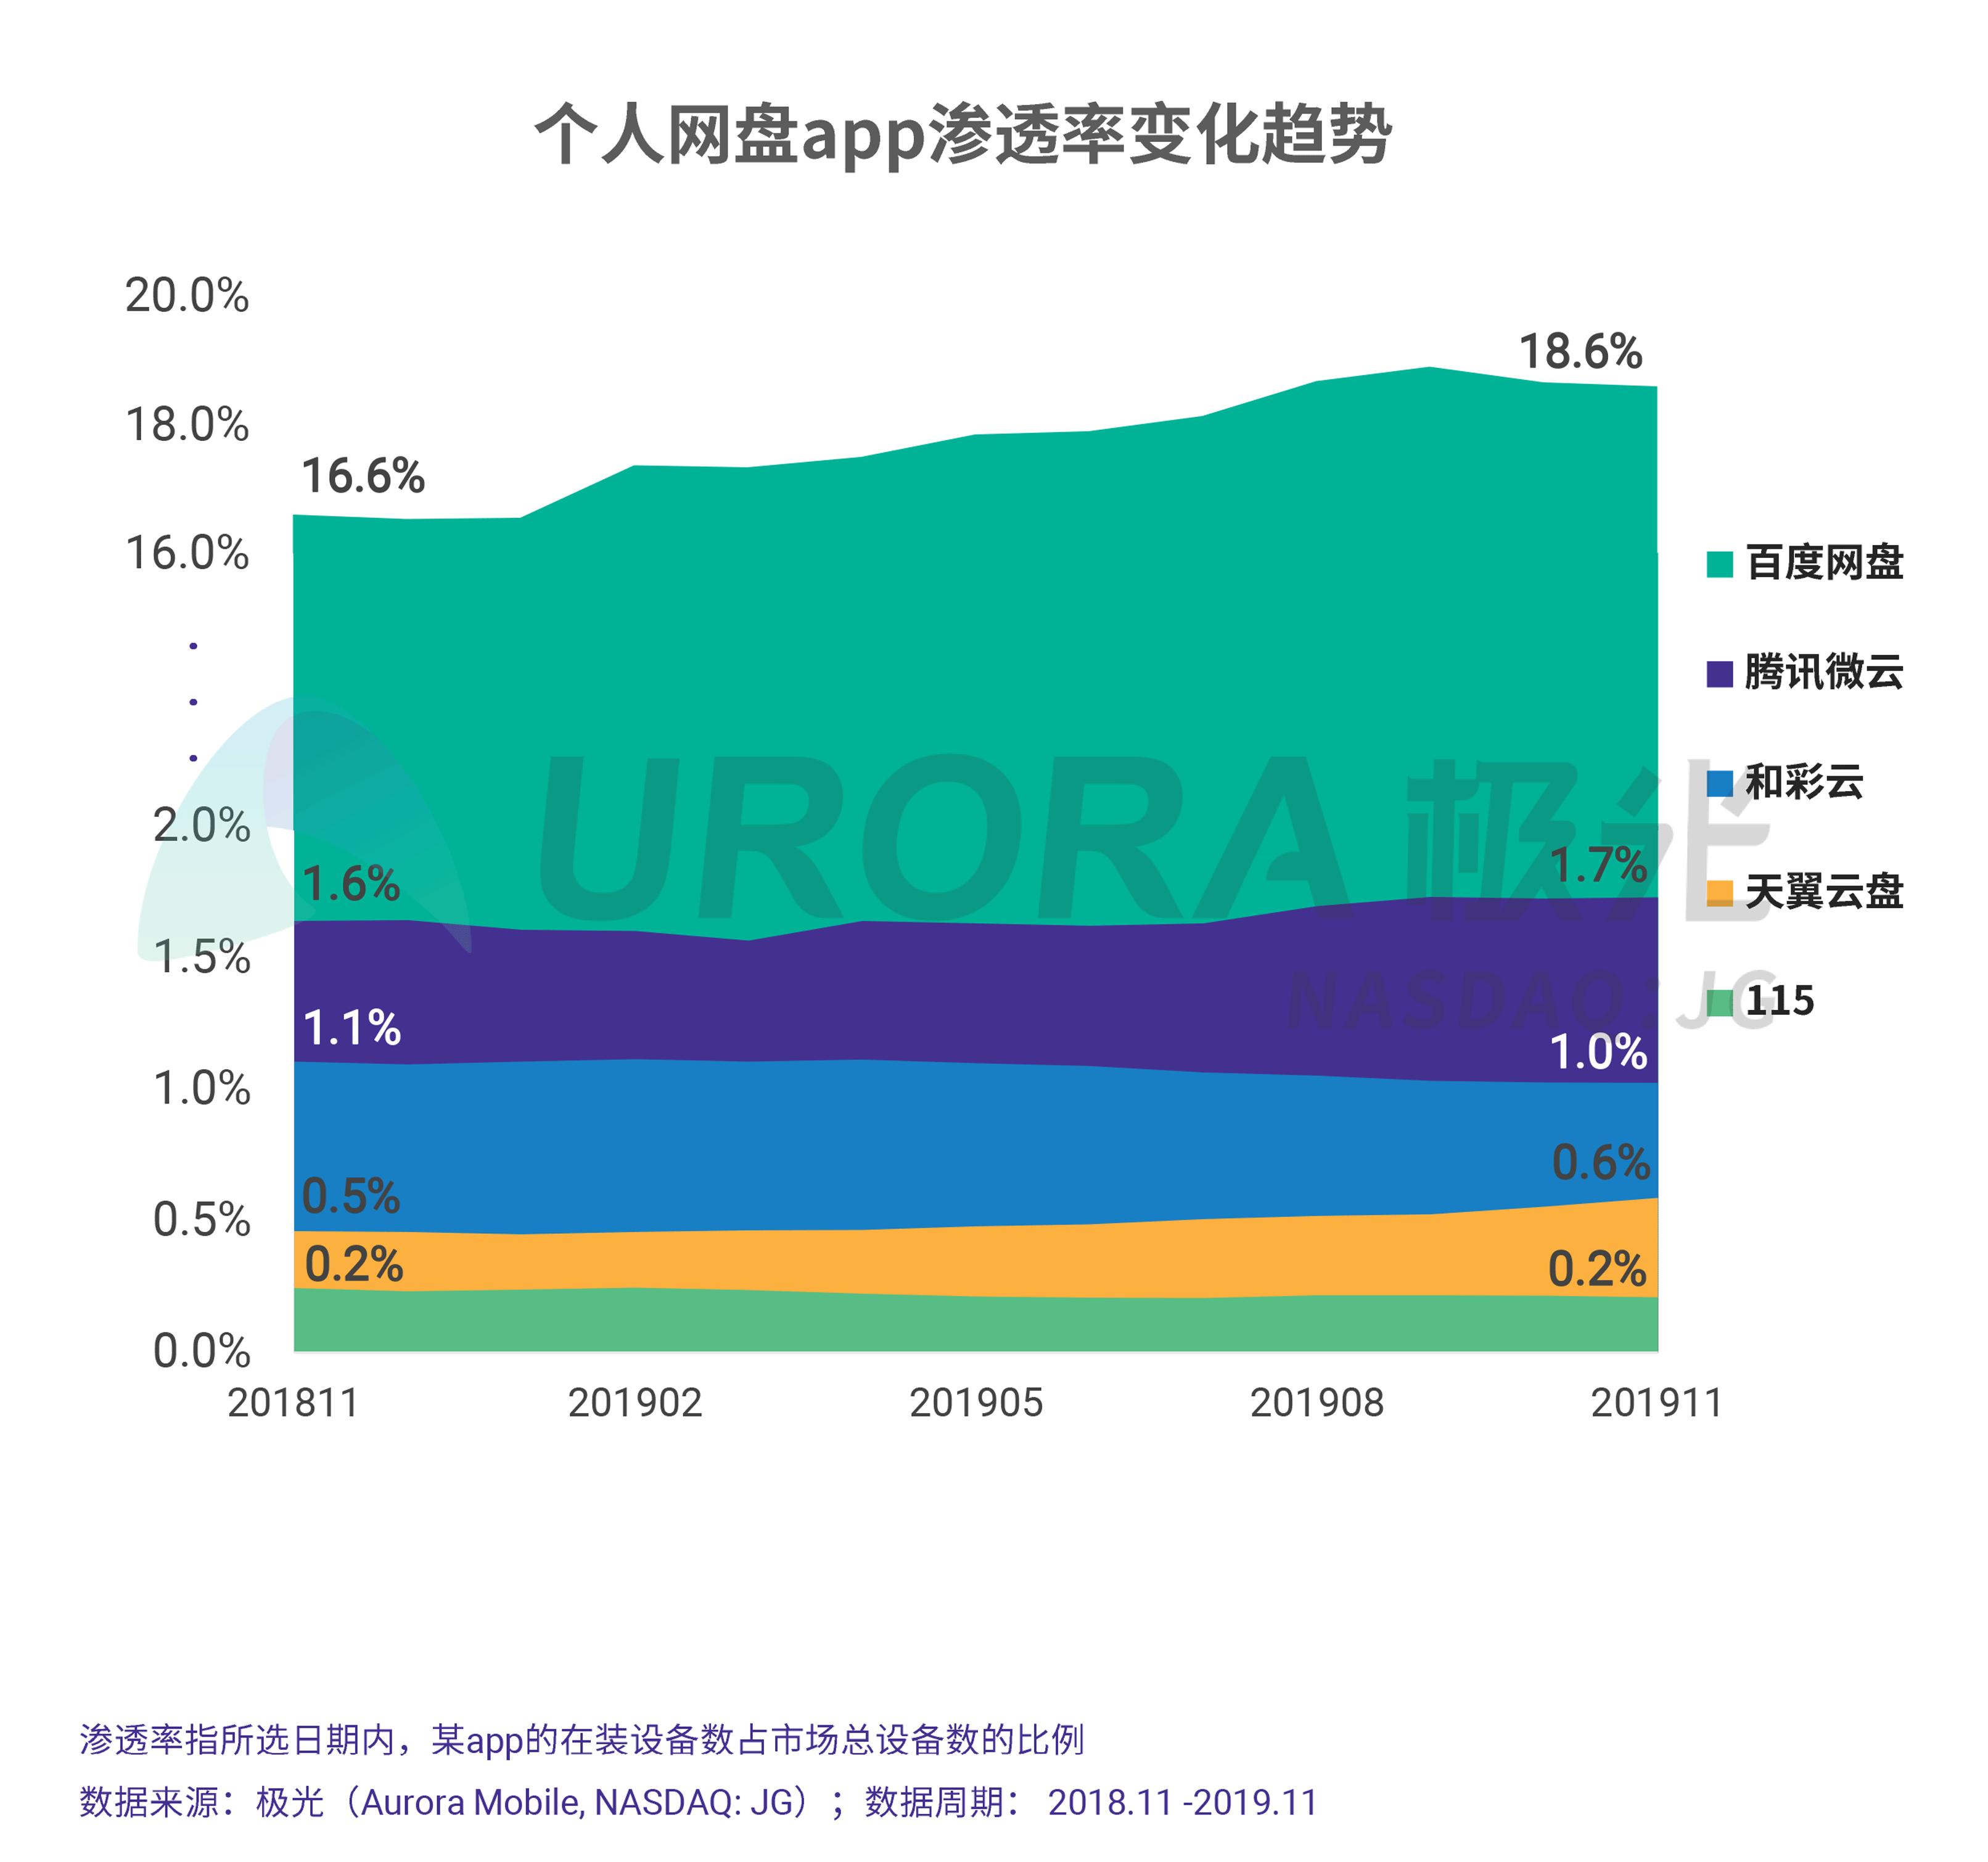 JIGUANG-个人网盘行业研究报告-final---切图版2-15.png